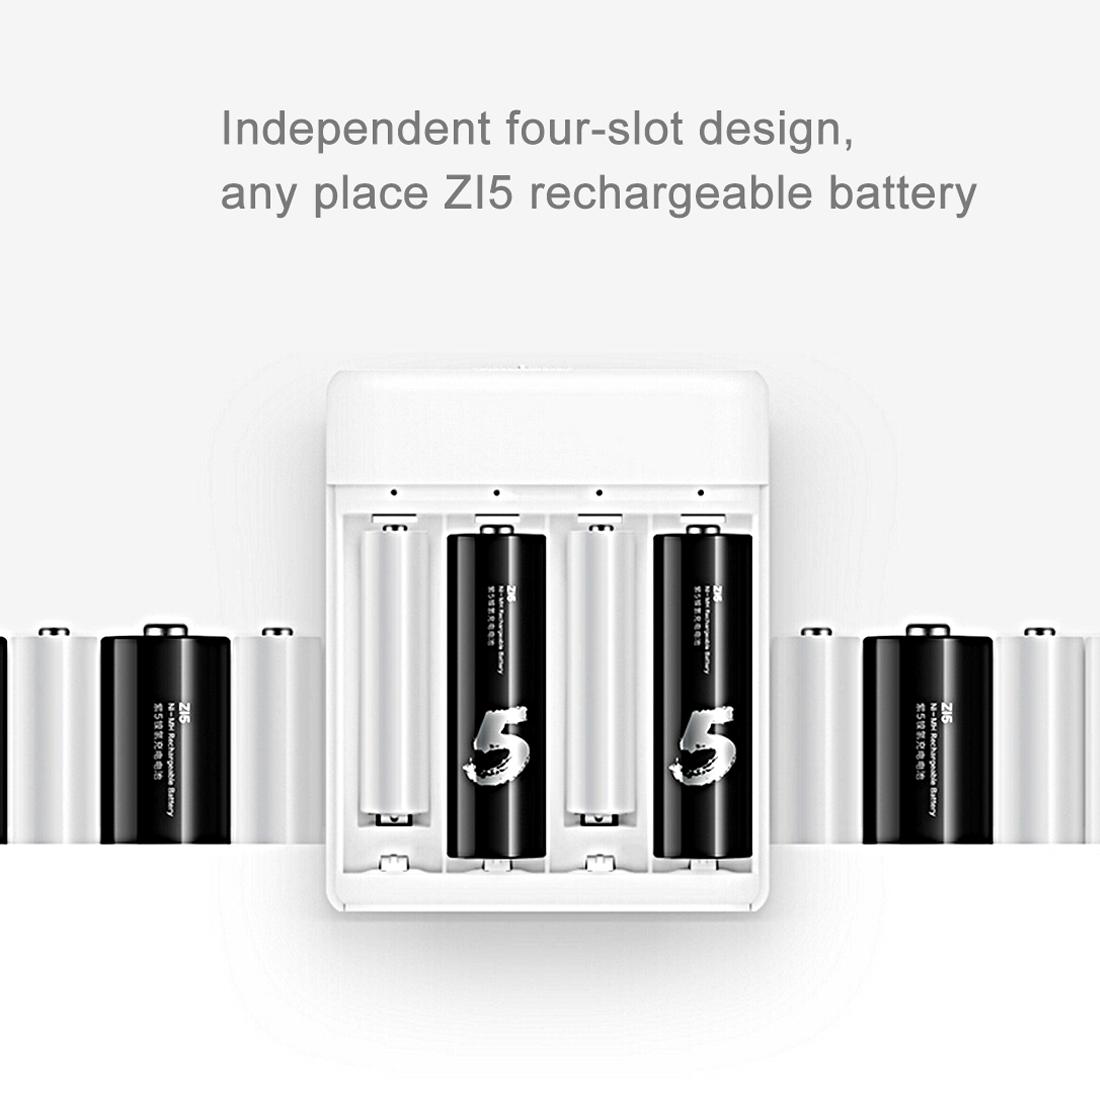 New Original Xiaomi Z15 Z17 4slots Rapid Smart Mini NI-MH AA AAA Battery Charger